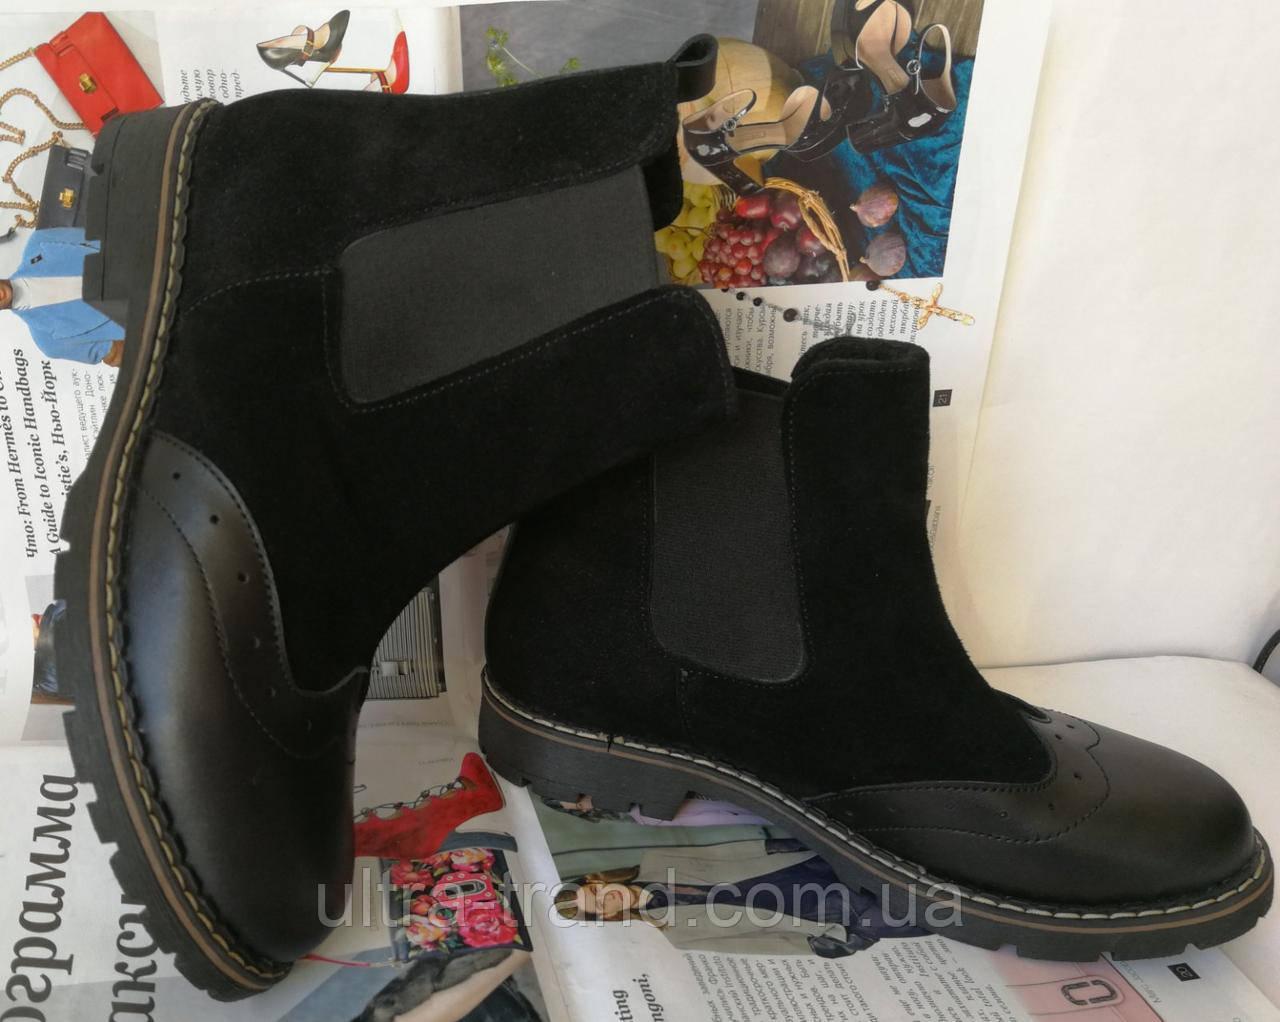 Женские зимние ботинки  Timberland челси оксфорд черный замш кожа мех Тимберланд